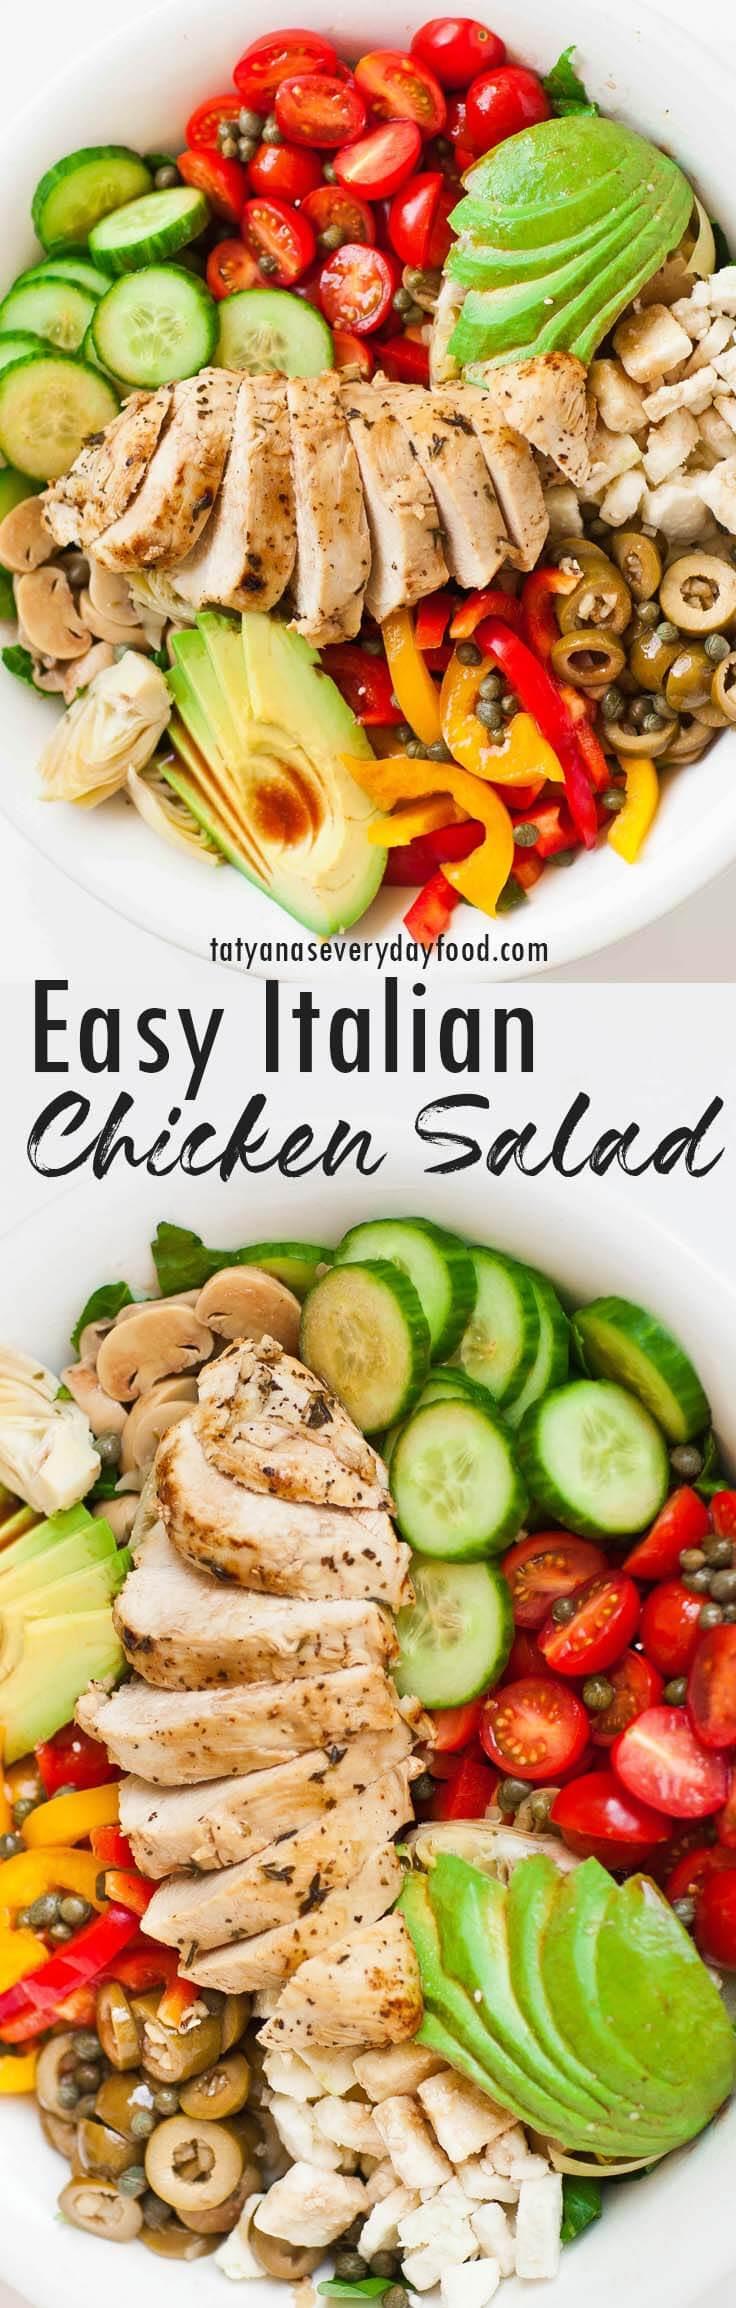 Easy Italian Chicken Salad video recipe